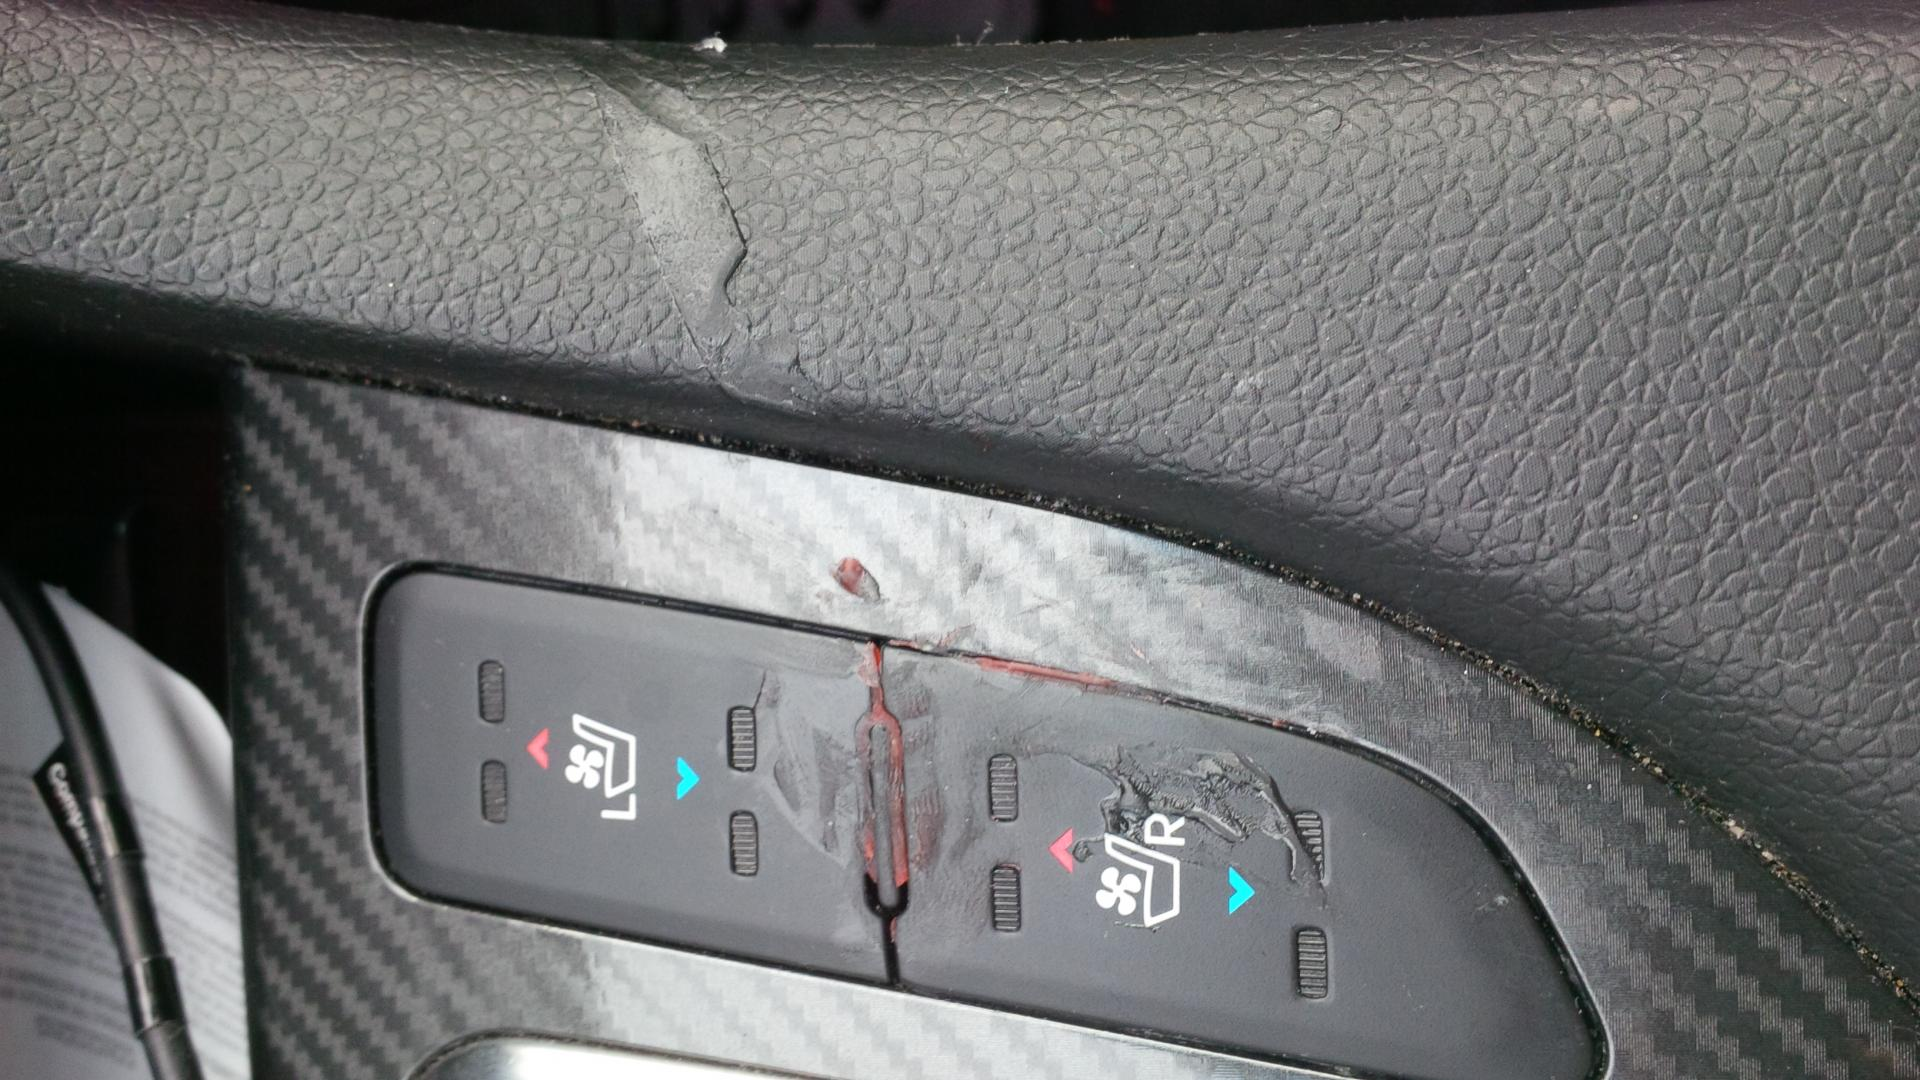 Kia Soul: Seat warmer